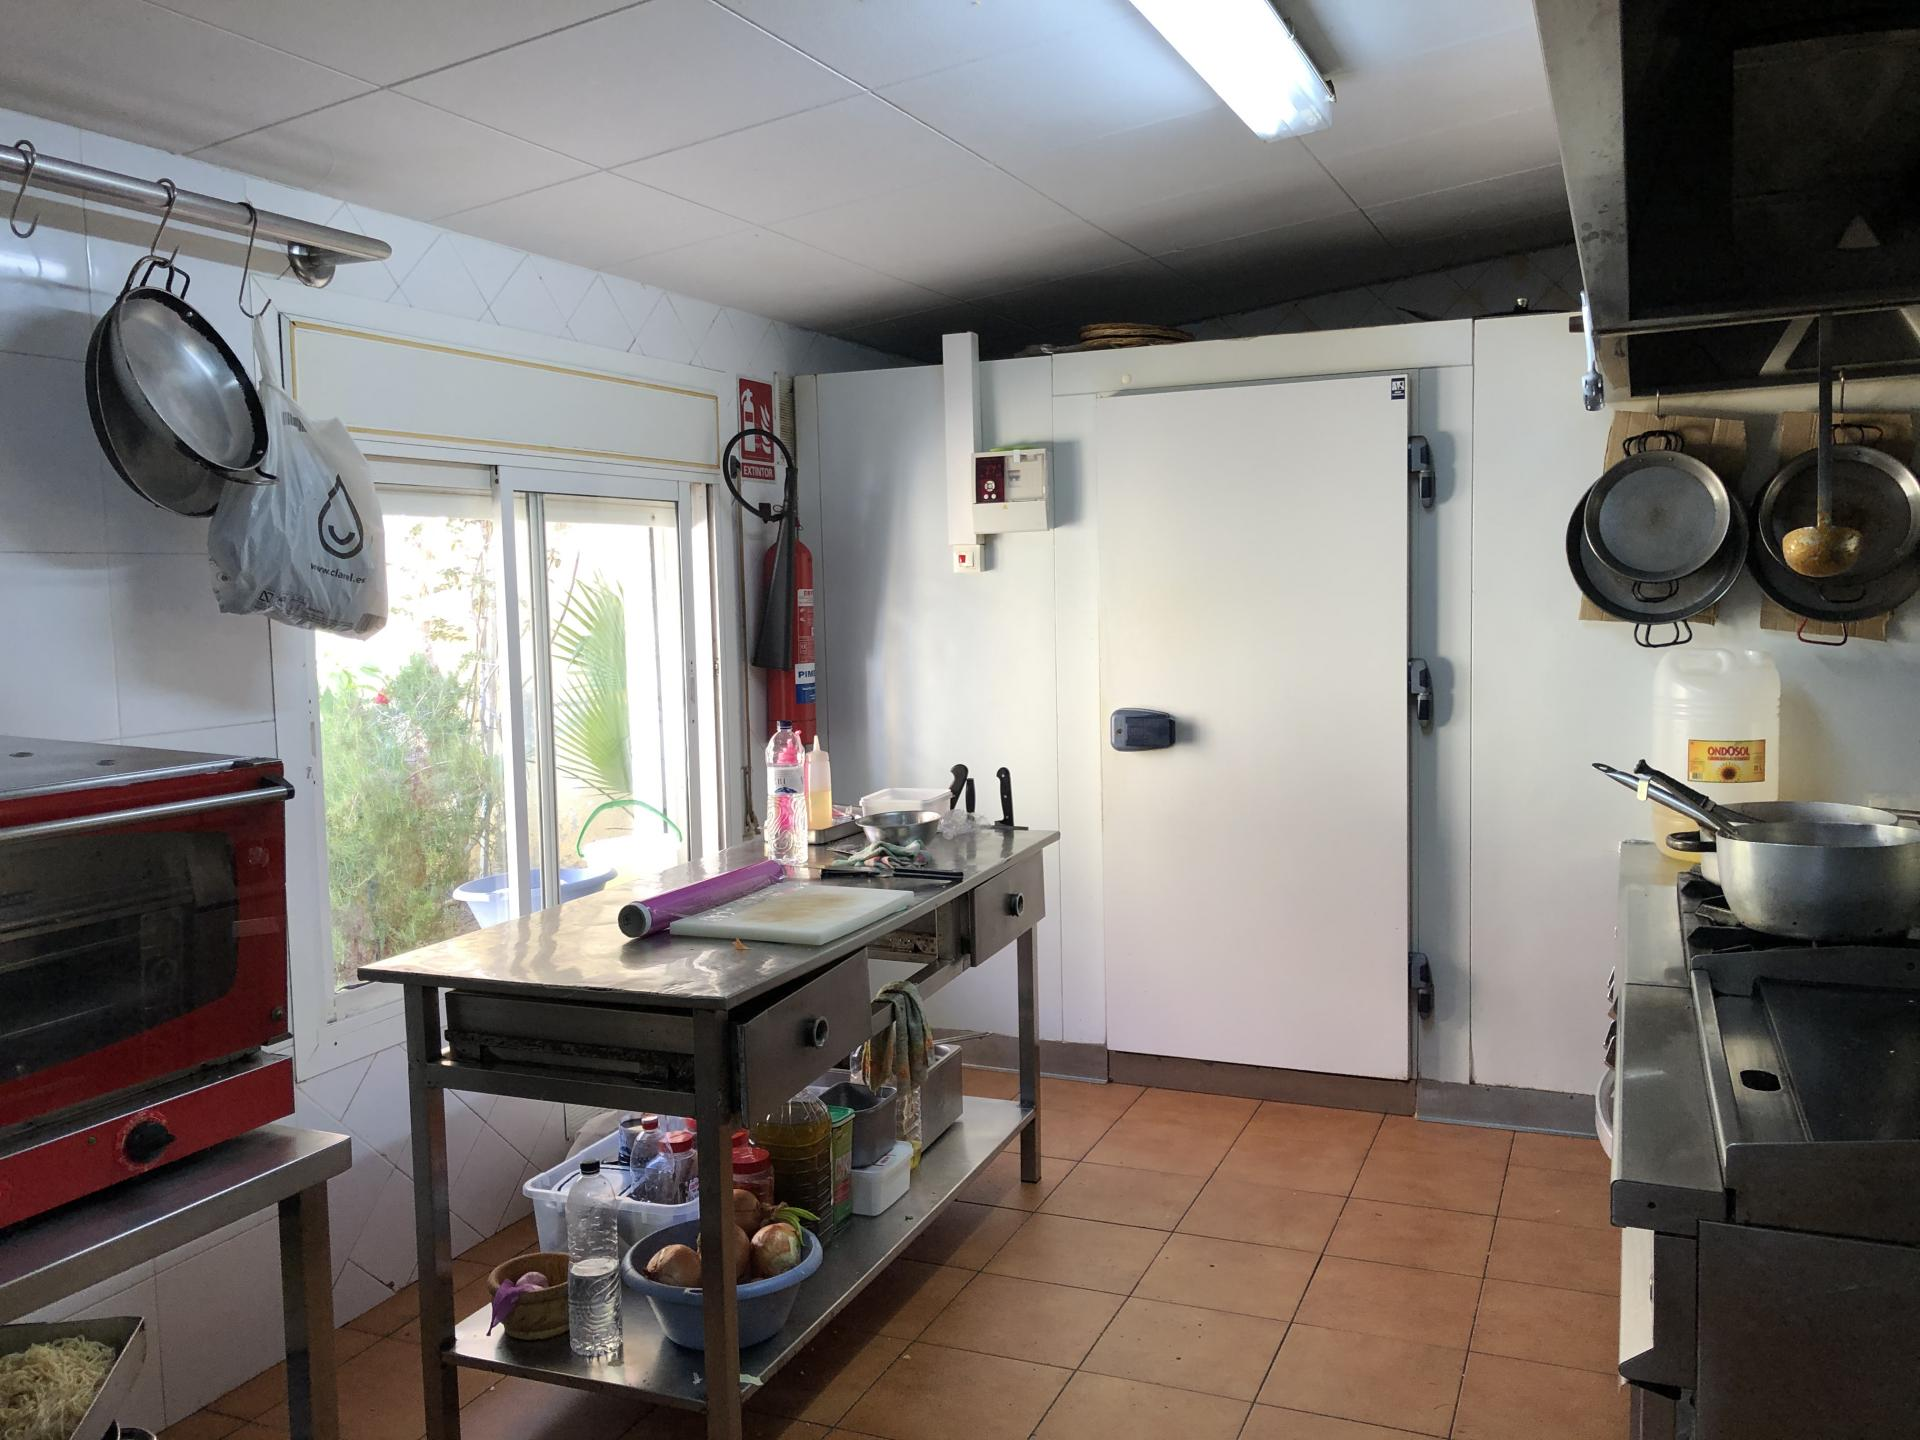 Foto 6 (V-735-2021) - Inmueble en  Venda a Santa Margarida i els Monjos